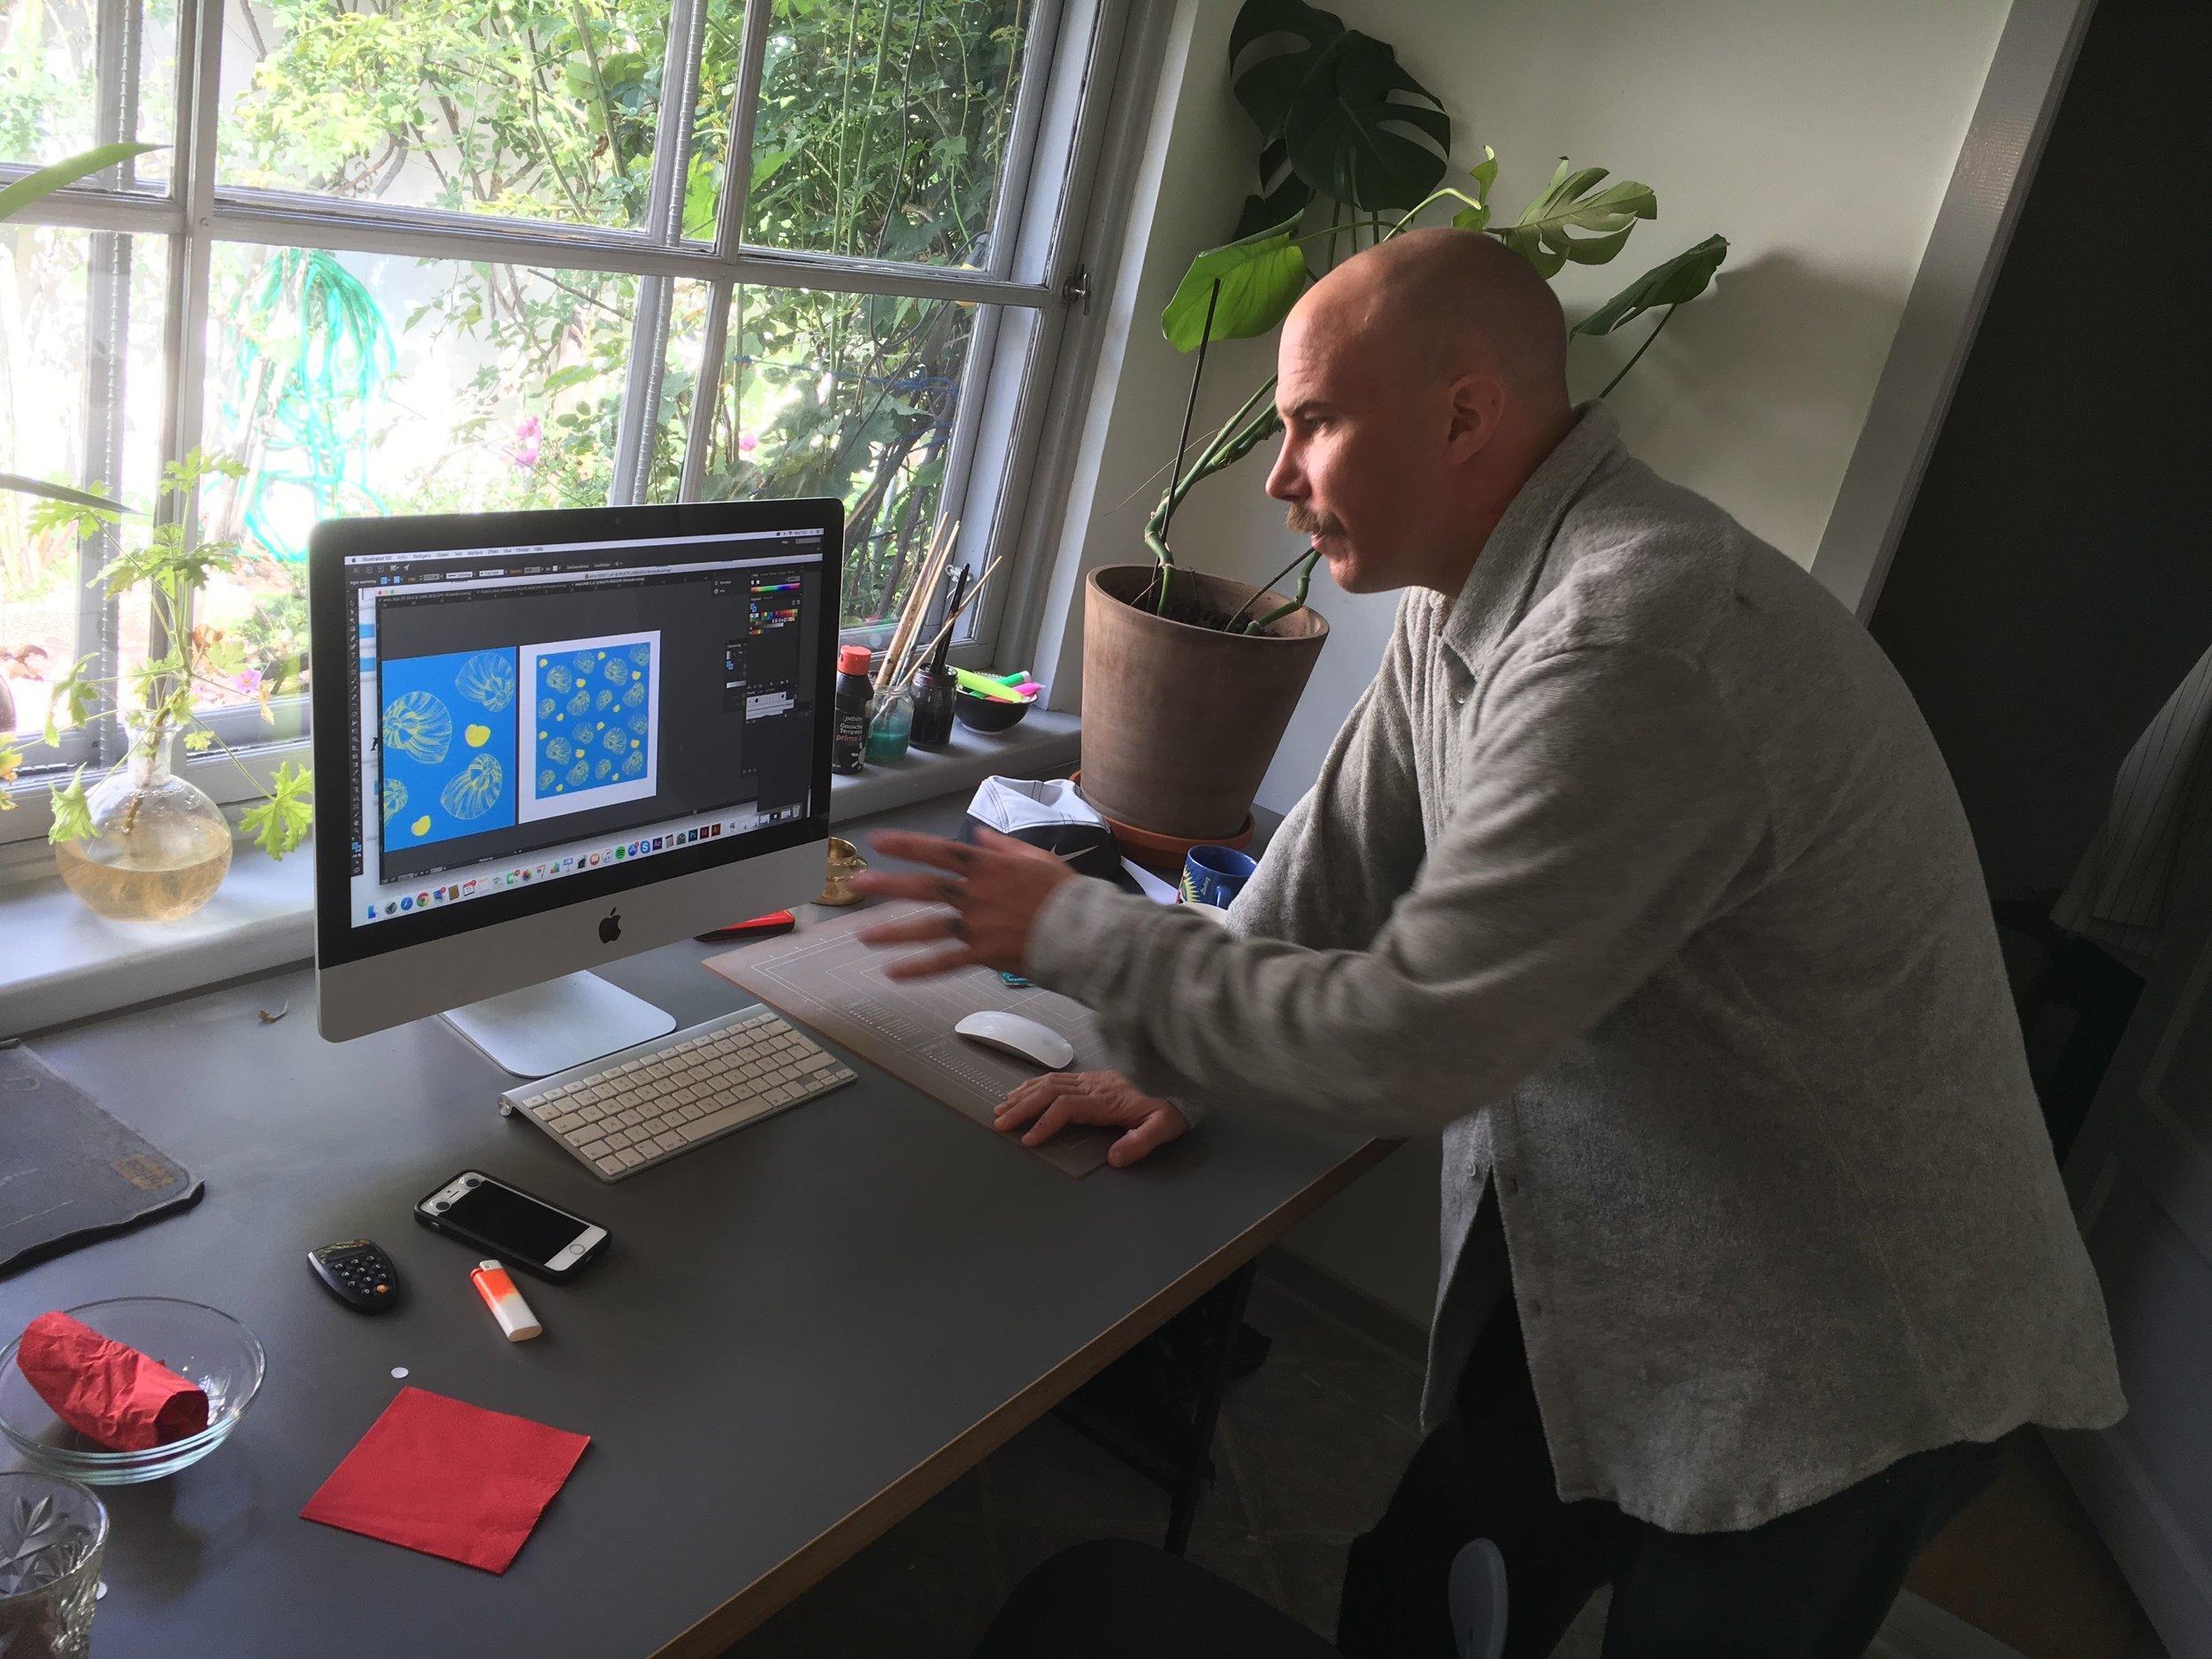 Kalle Aulin, Art Director